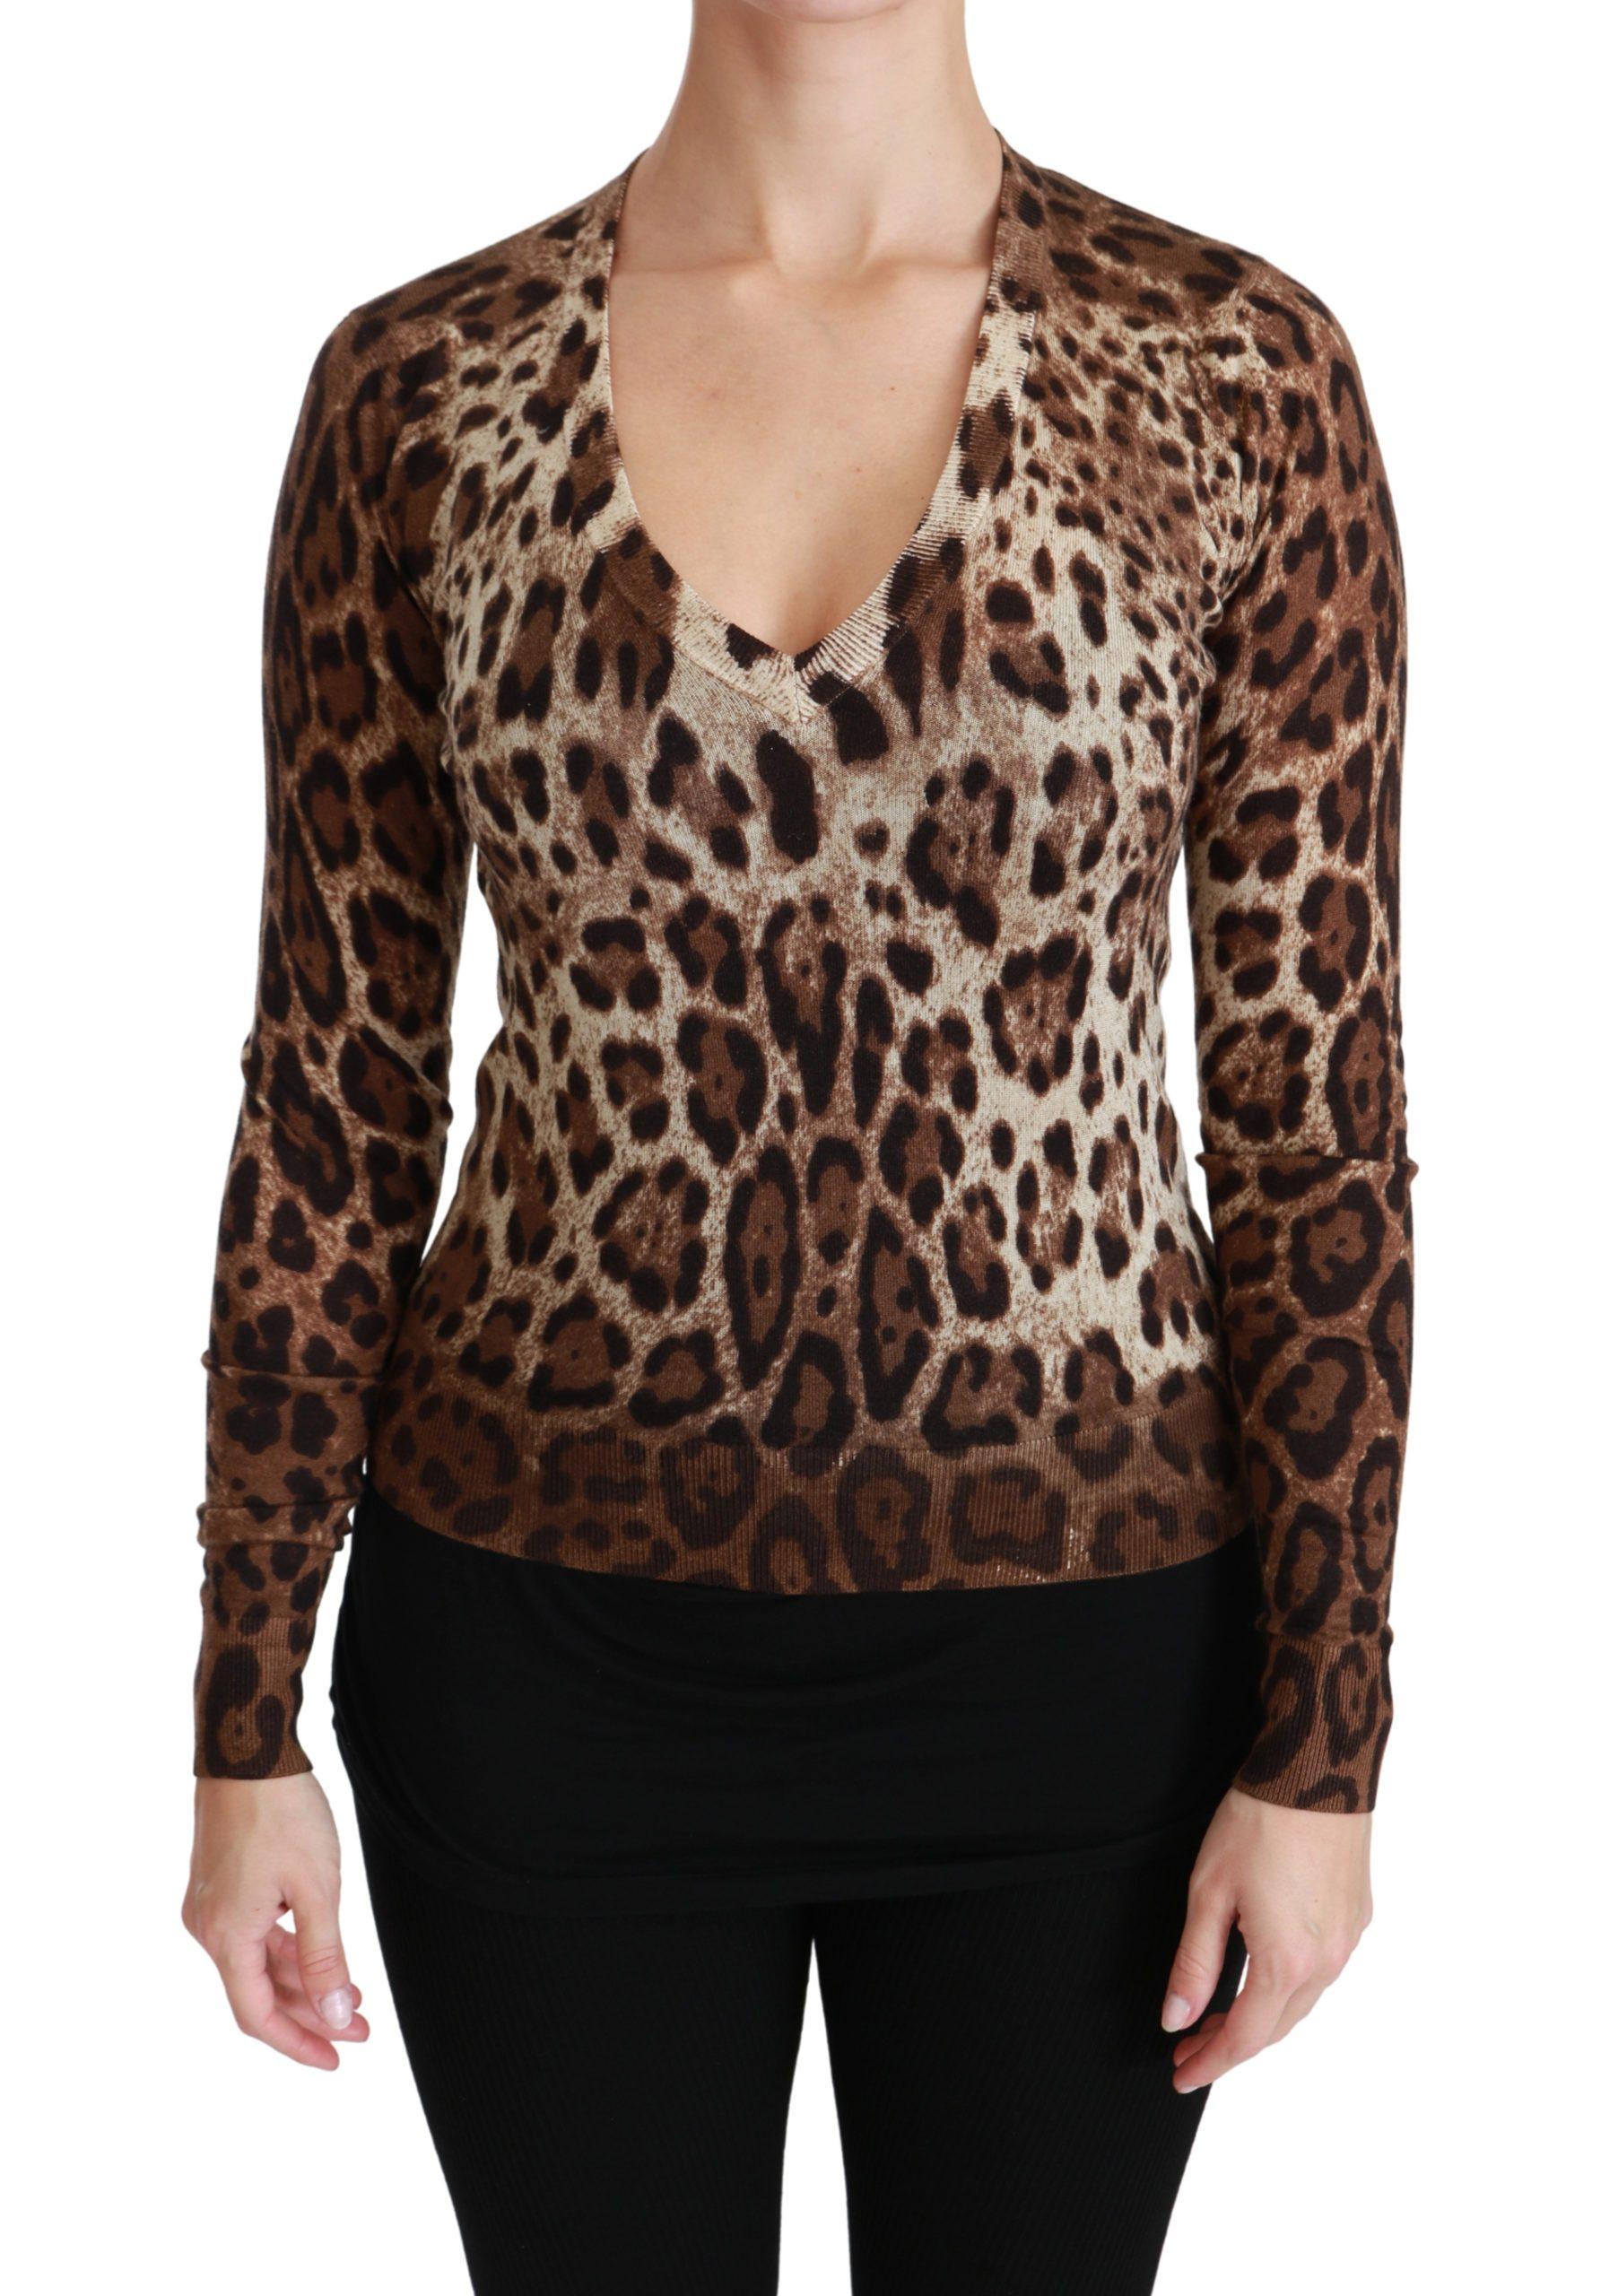 Dolce & Gabbana Women's Leopard Cashmere V-neck Top Sweater Brown TSH4449 - IT36   XS